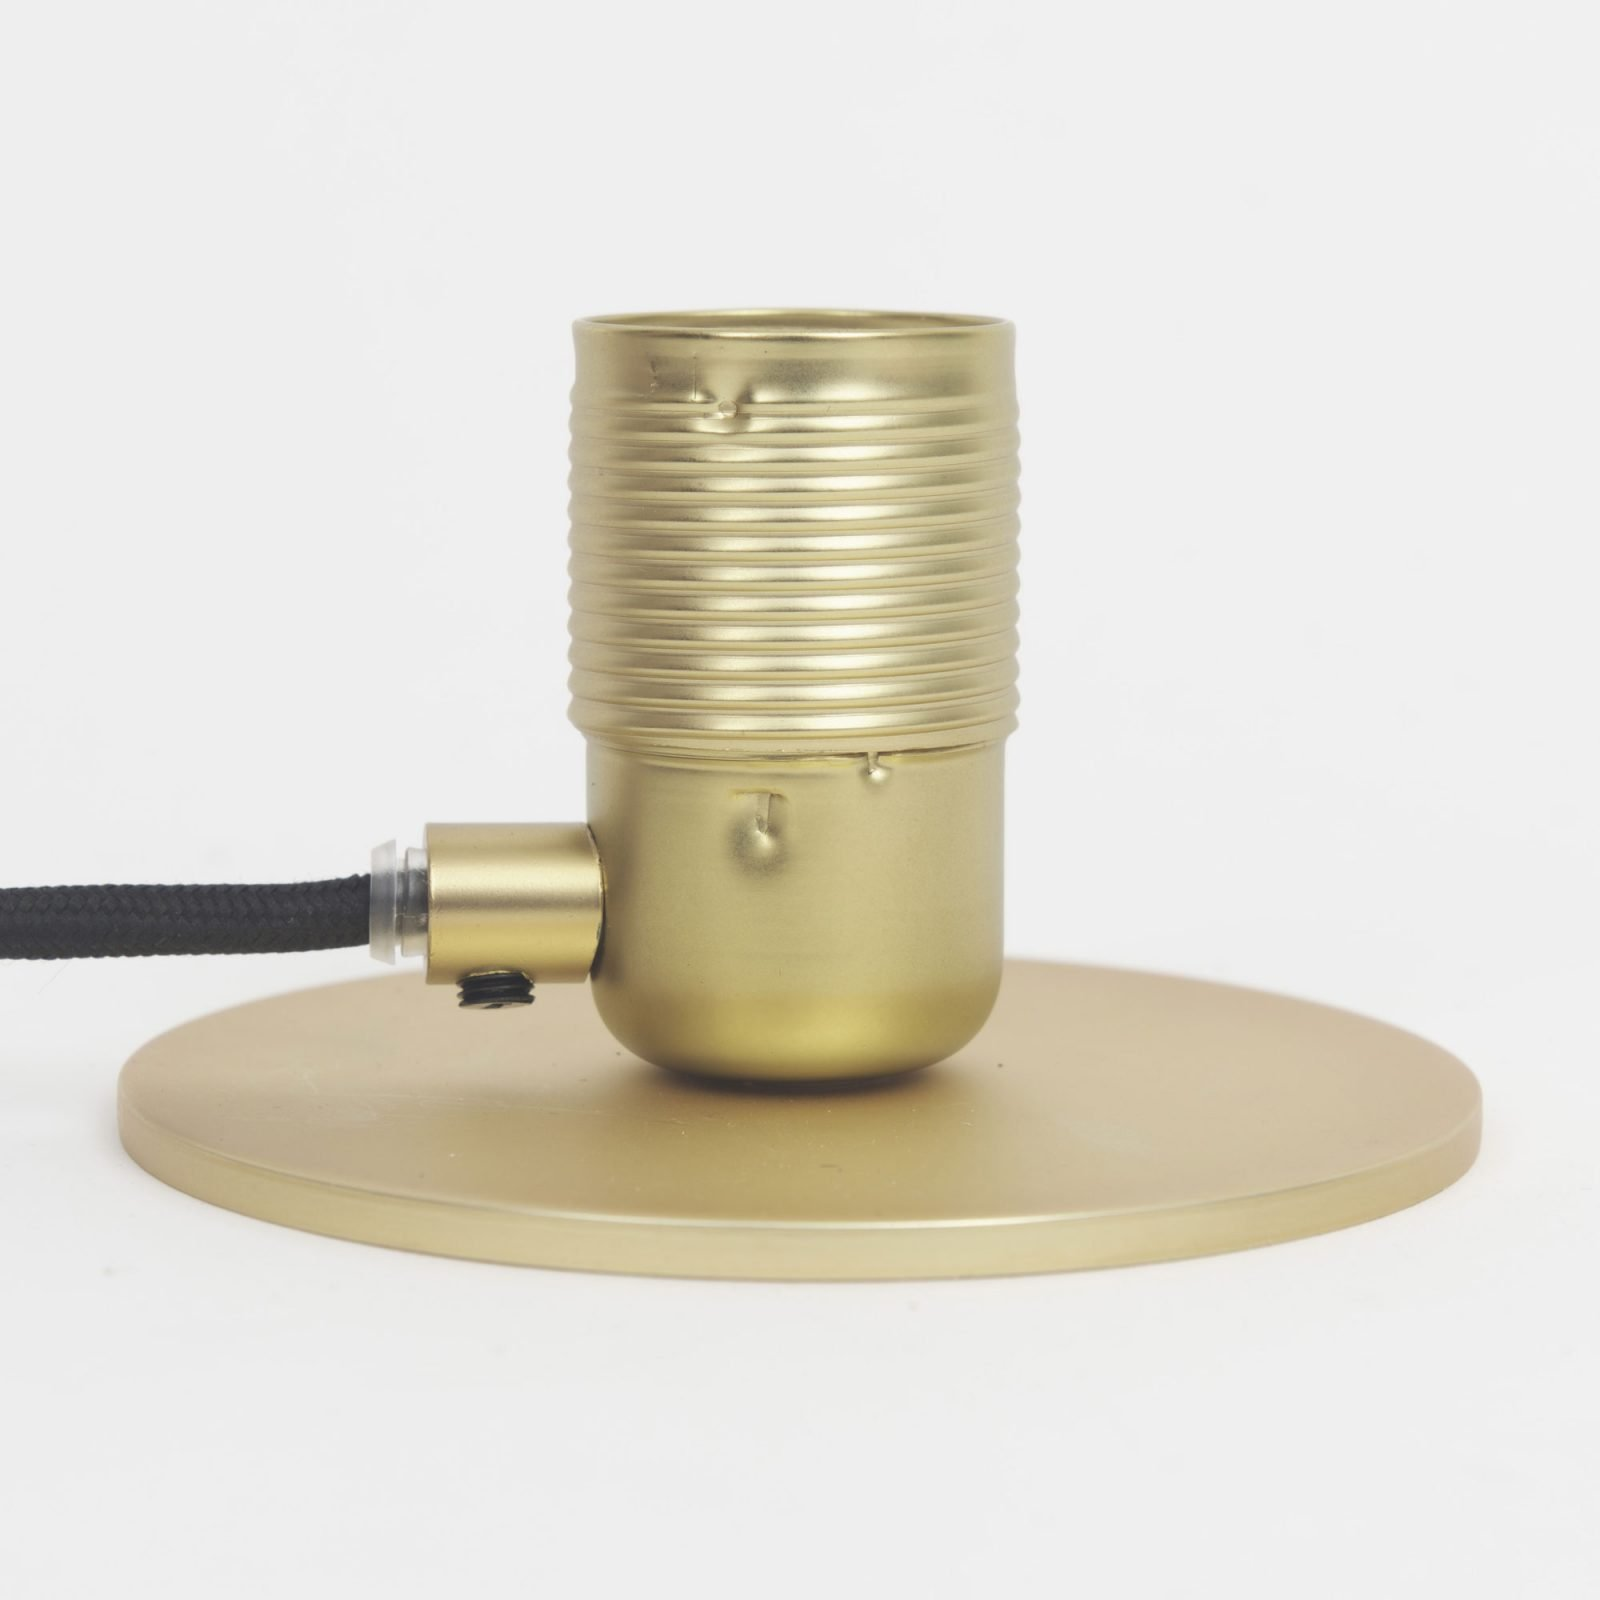 e27-table-lamp-brass-3